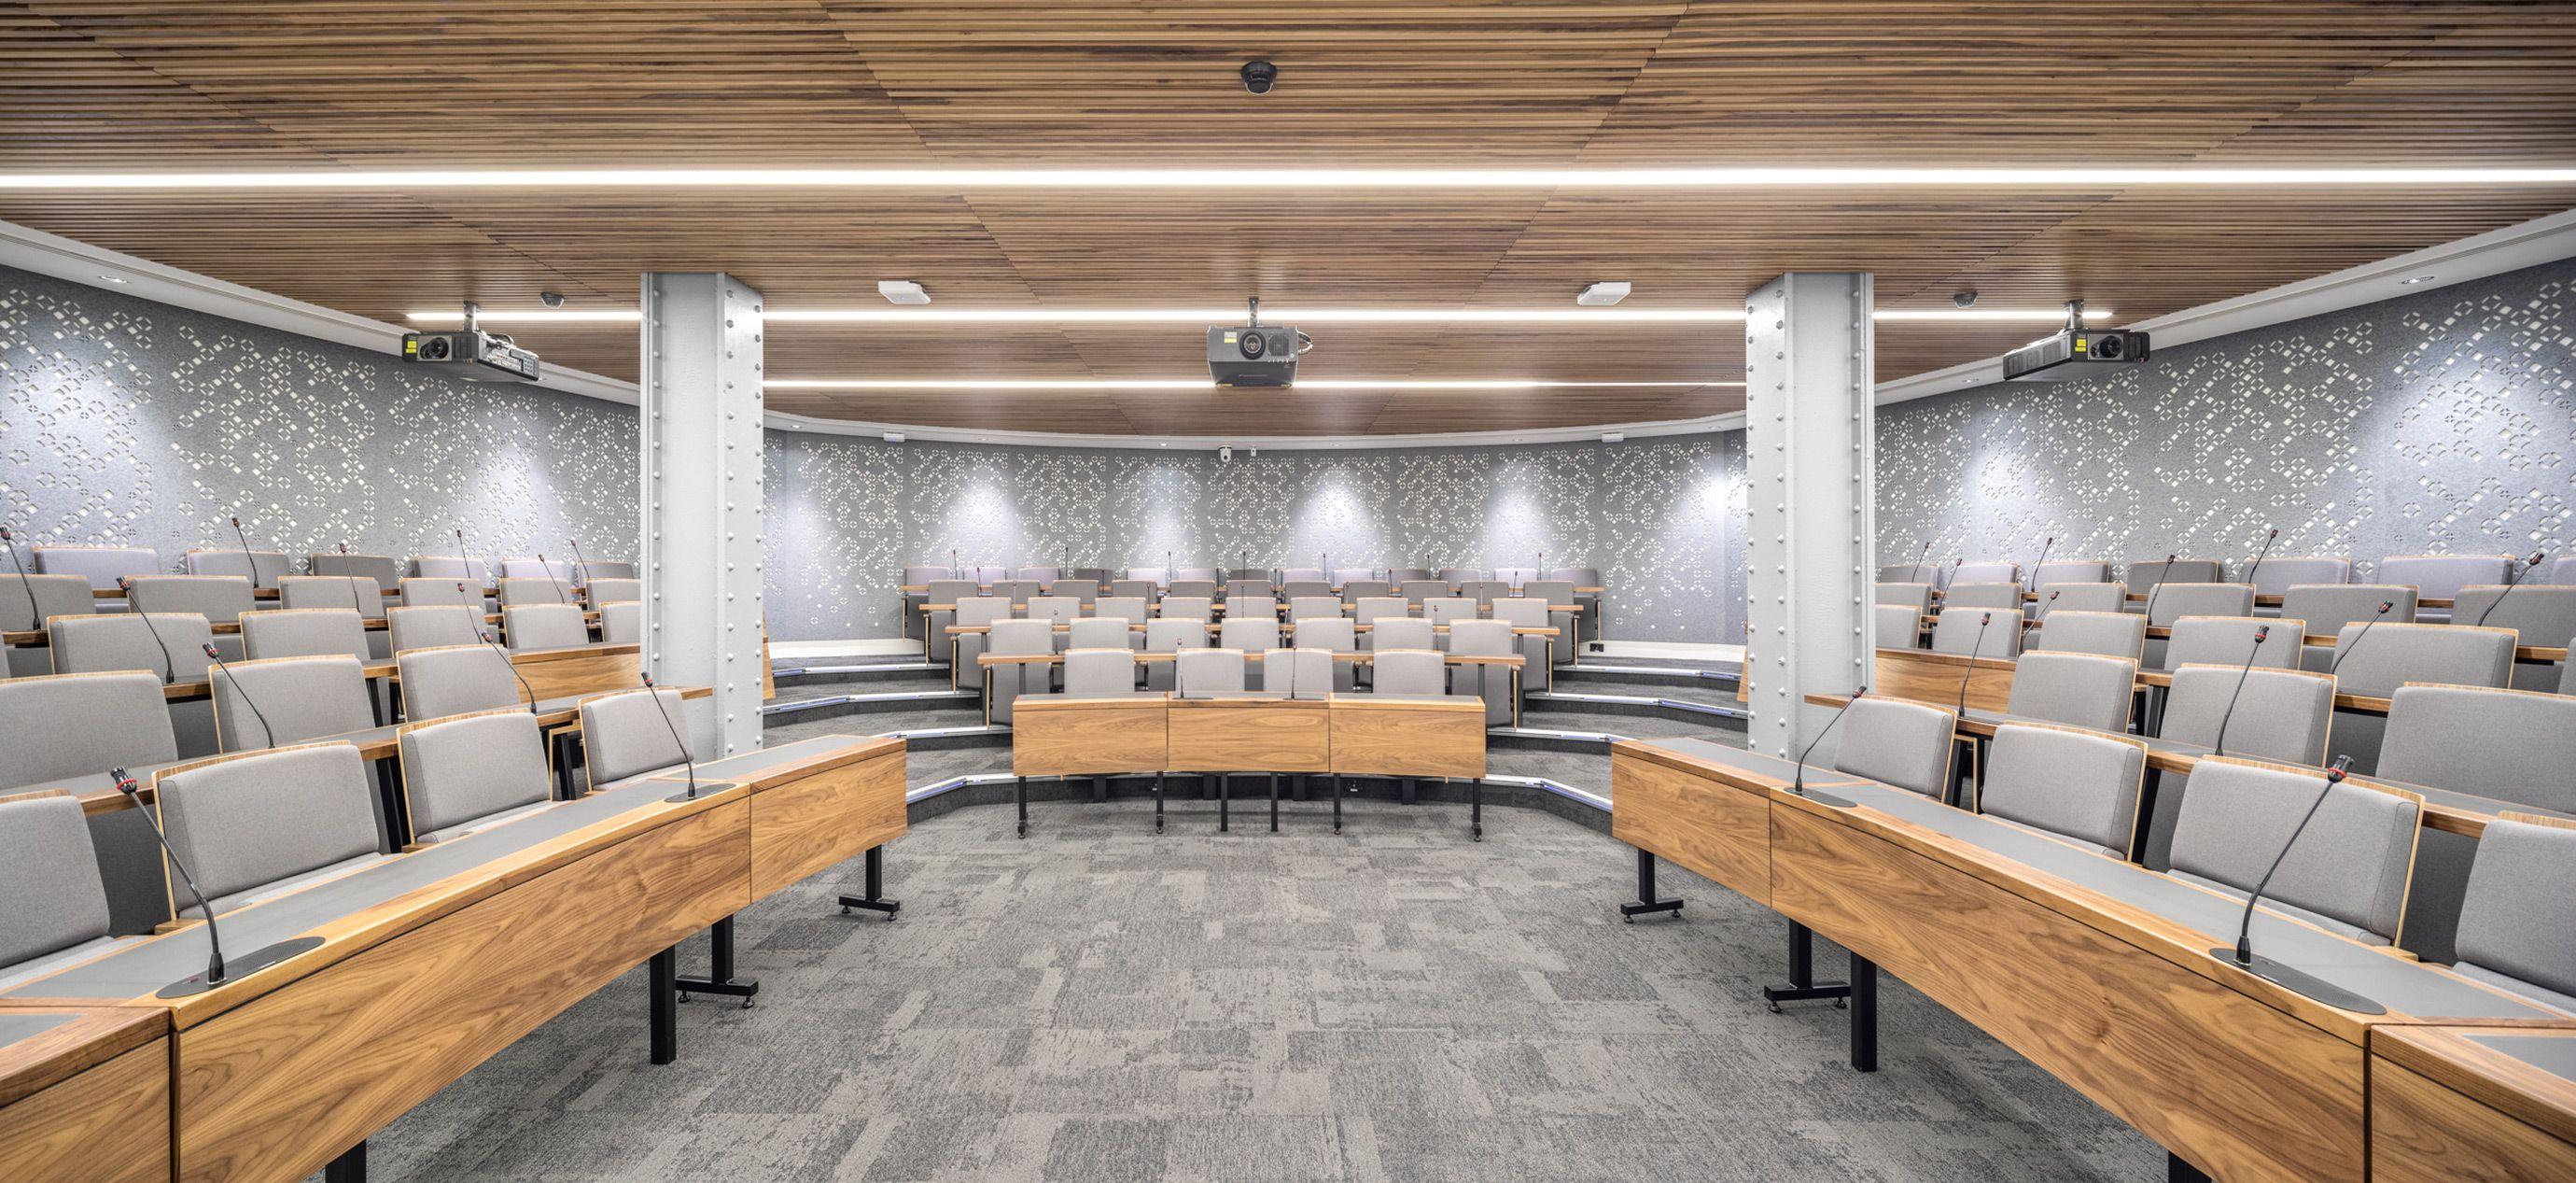 Bush House Lecture Theatre